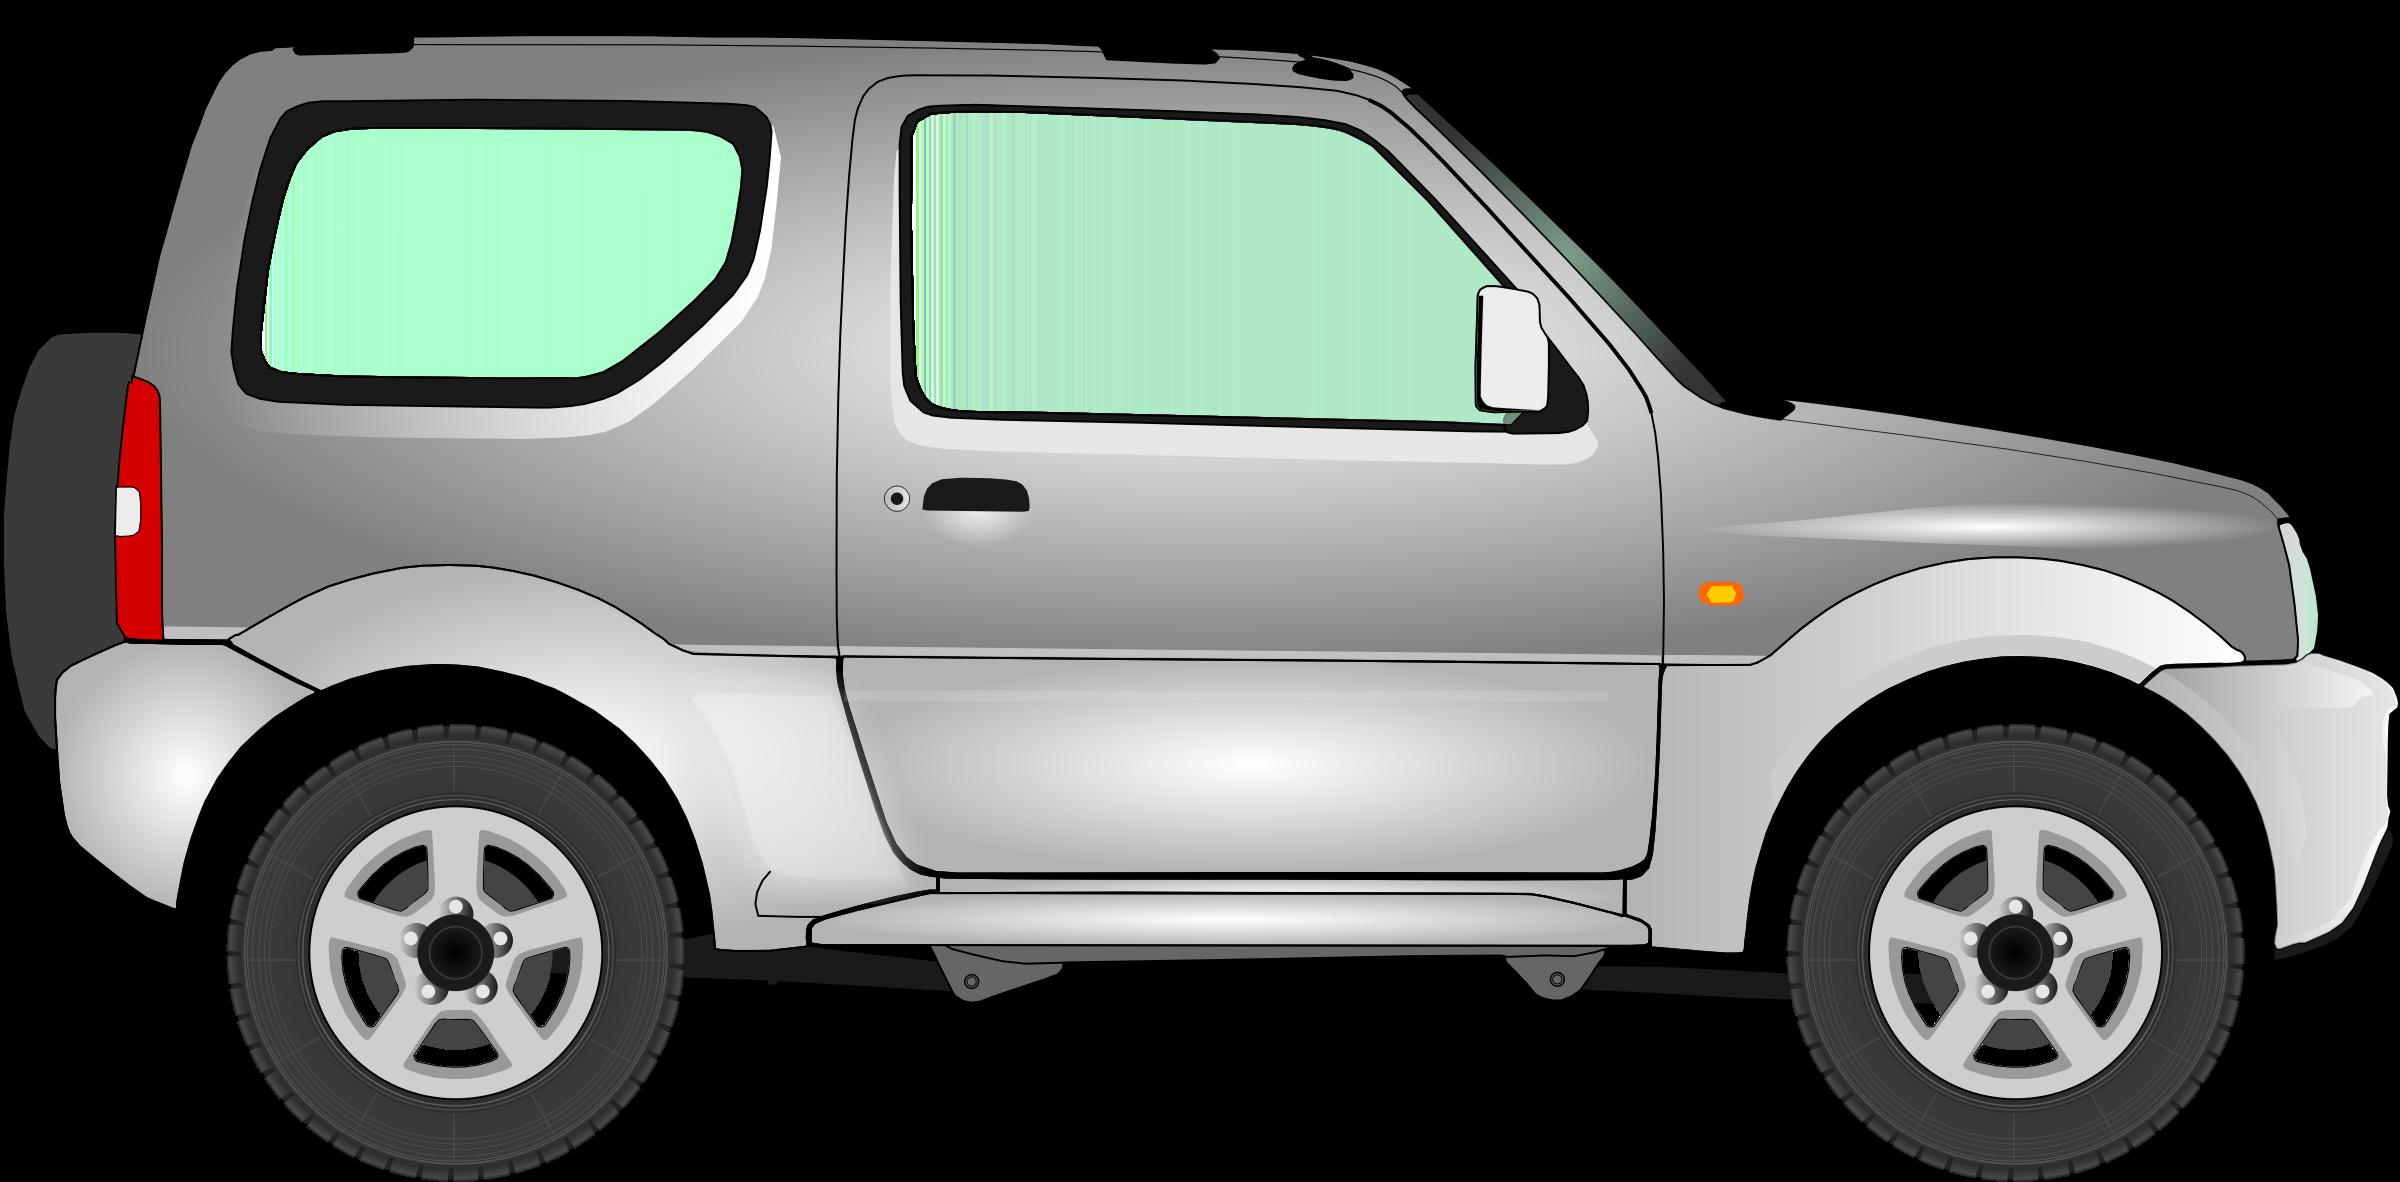 Crash car banner transparent png files, Free CLip Art Download.